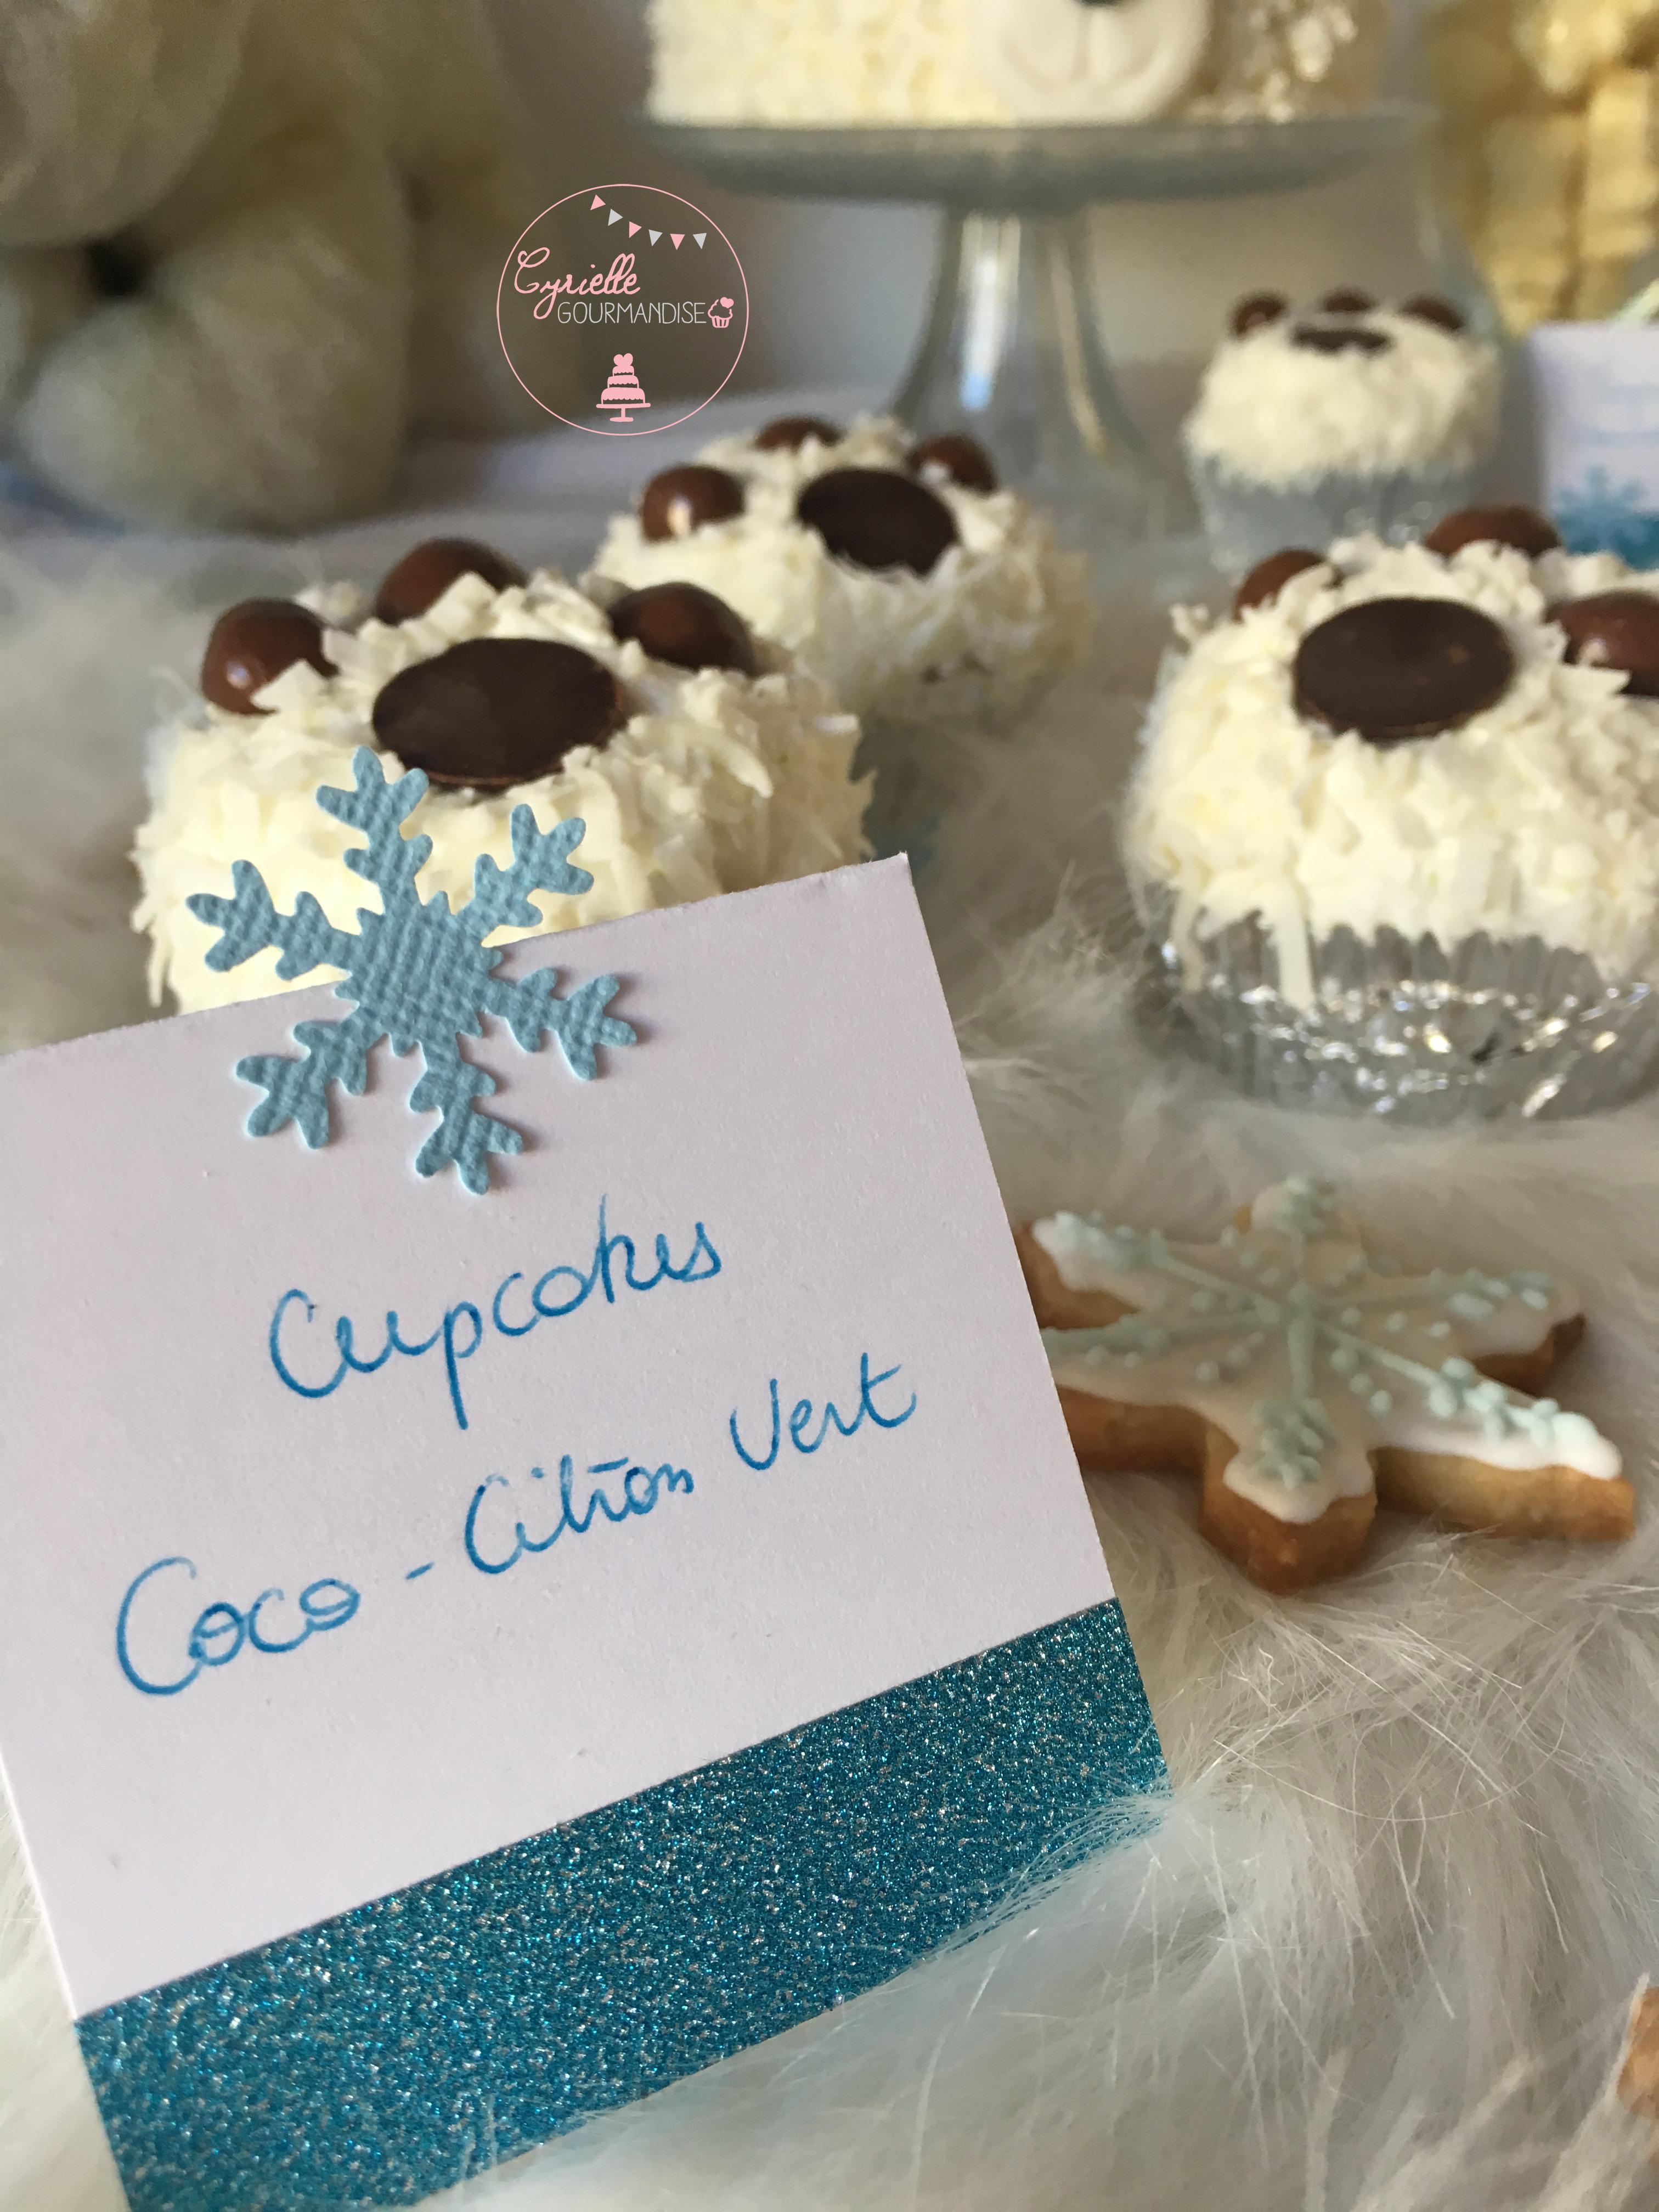 Cupcakes Coco Citron Vert 2